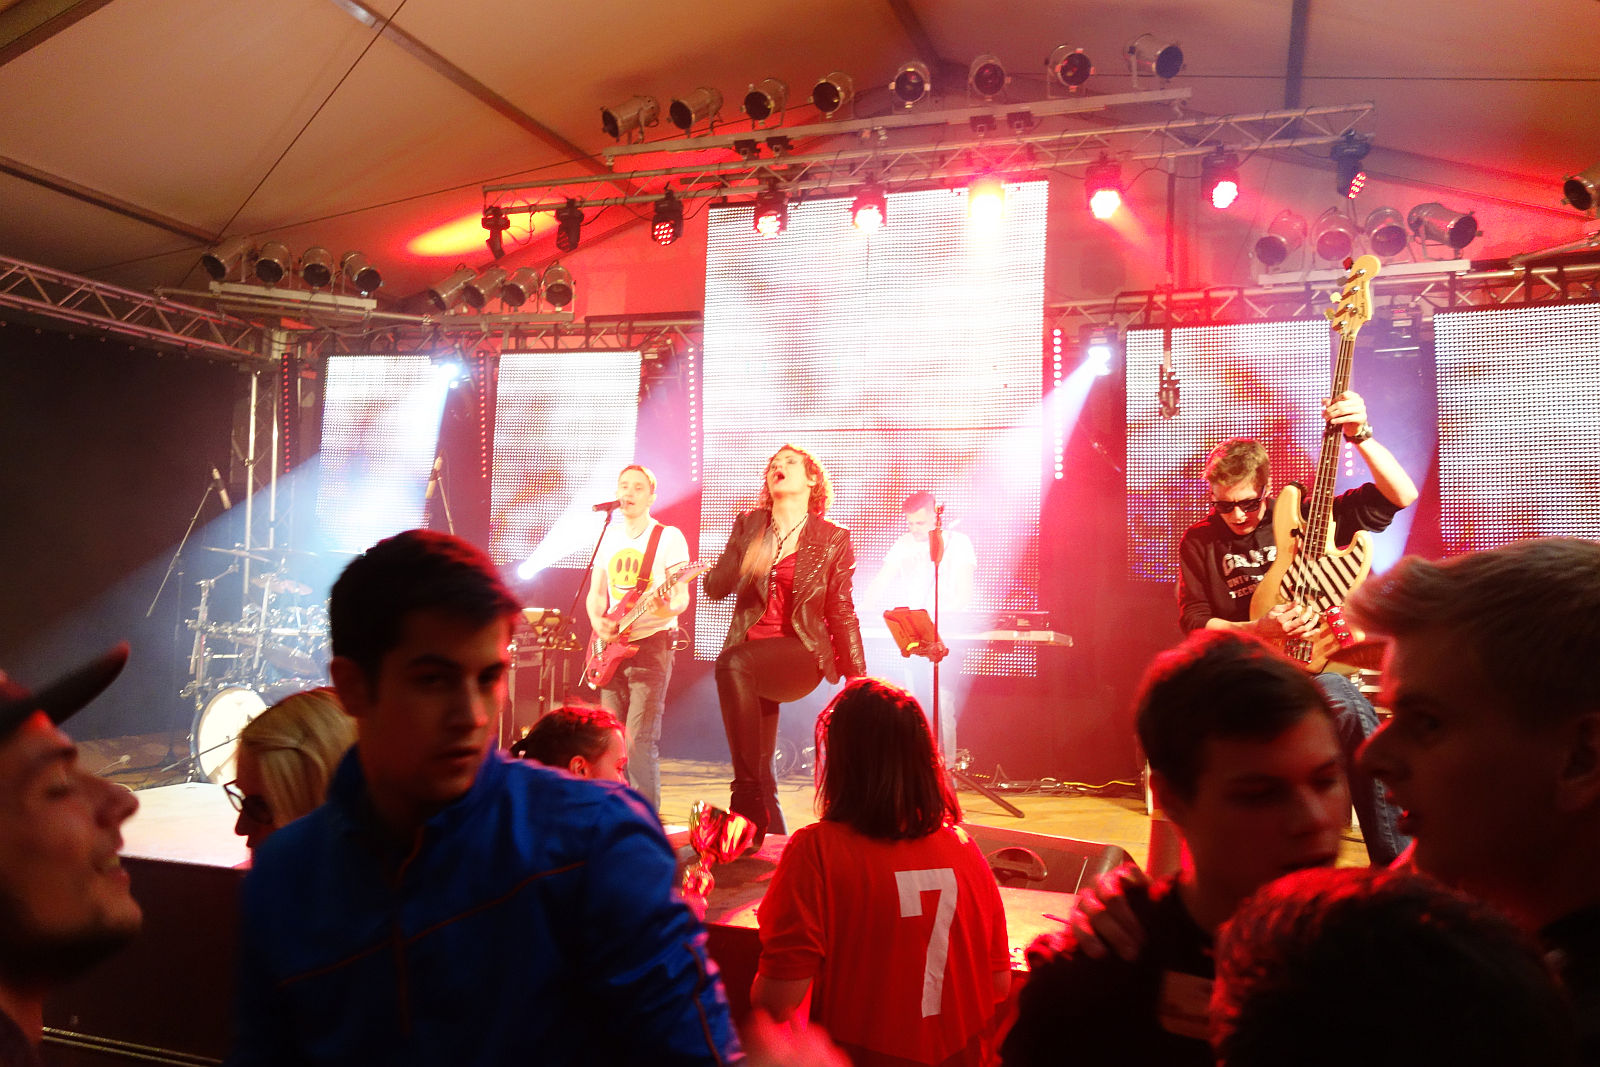 Rückblick Sportlerfest Arbesbach